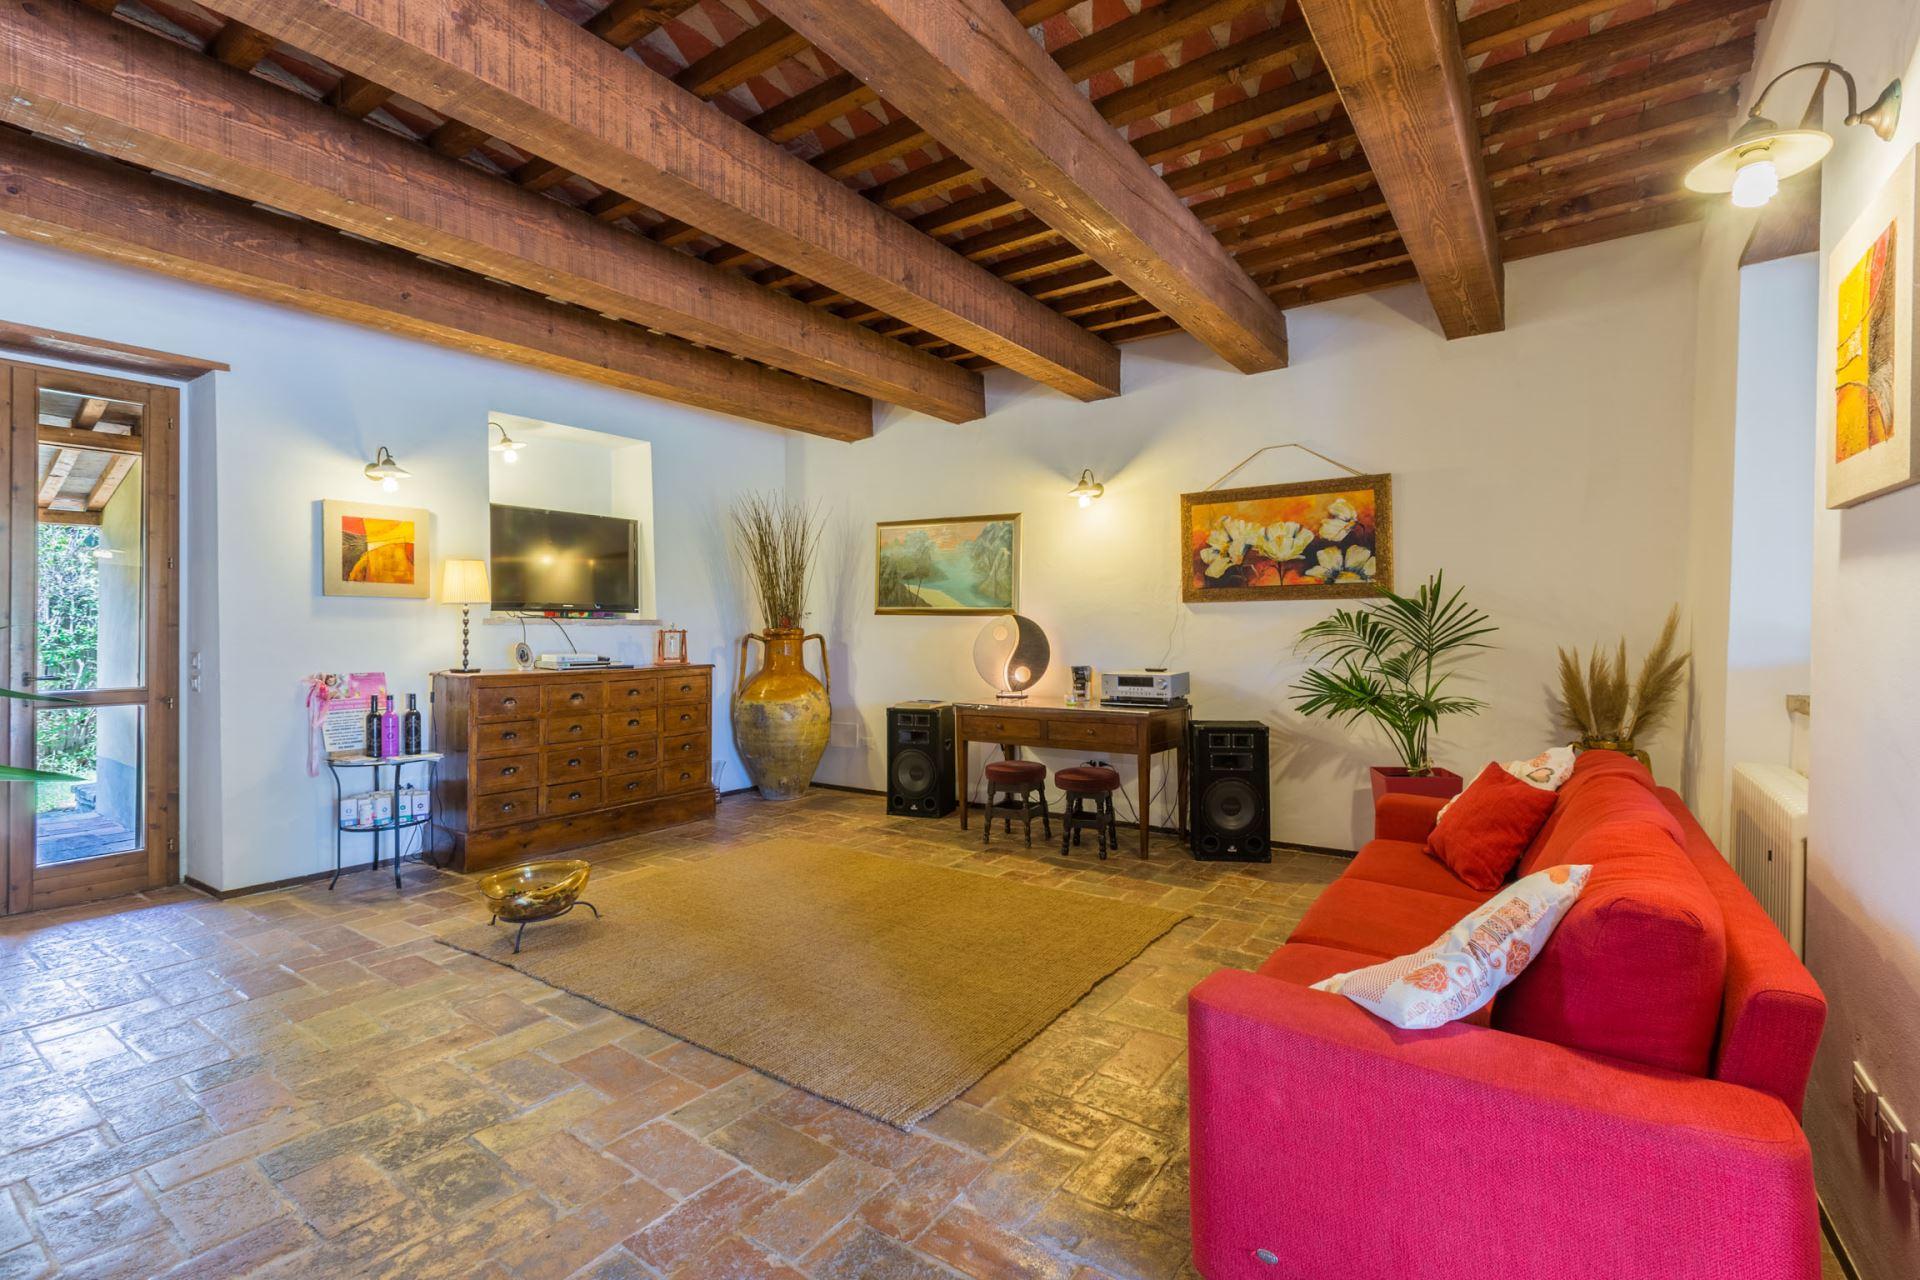 Ferienhaus VILLA DELLE VIGNE (2129909), Pesaro, Pesaro und Urbino, Marken, Italien, Bild 5